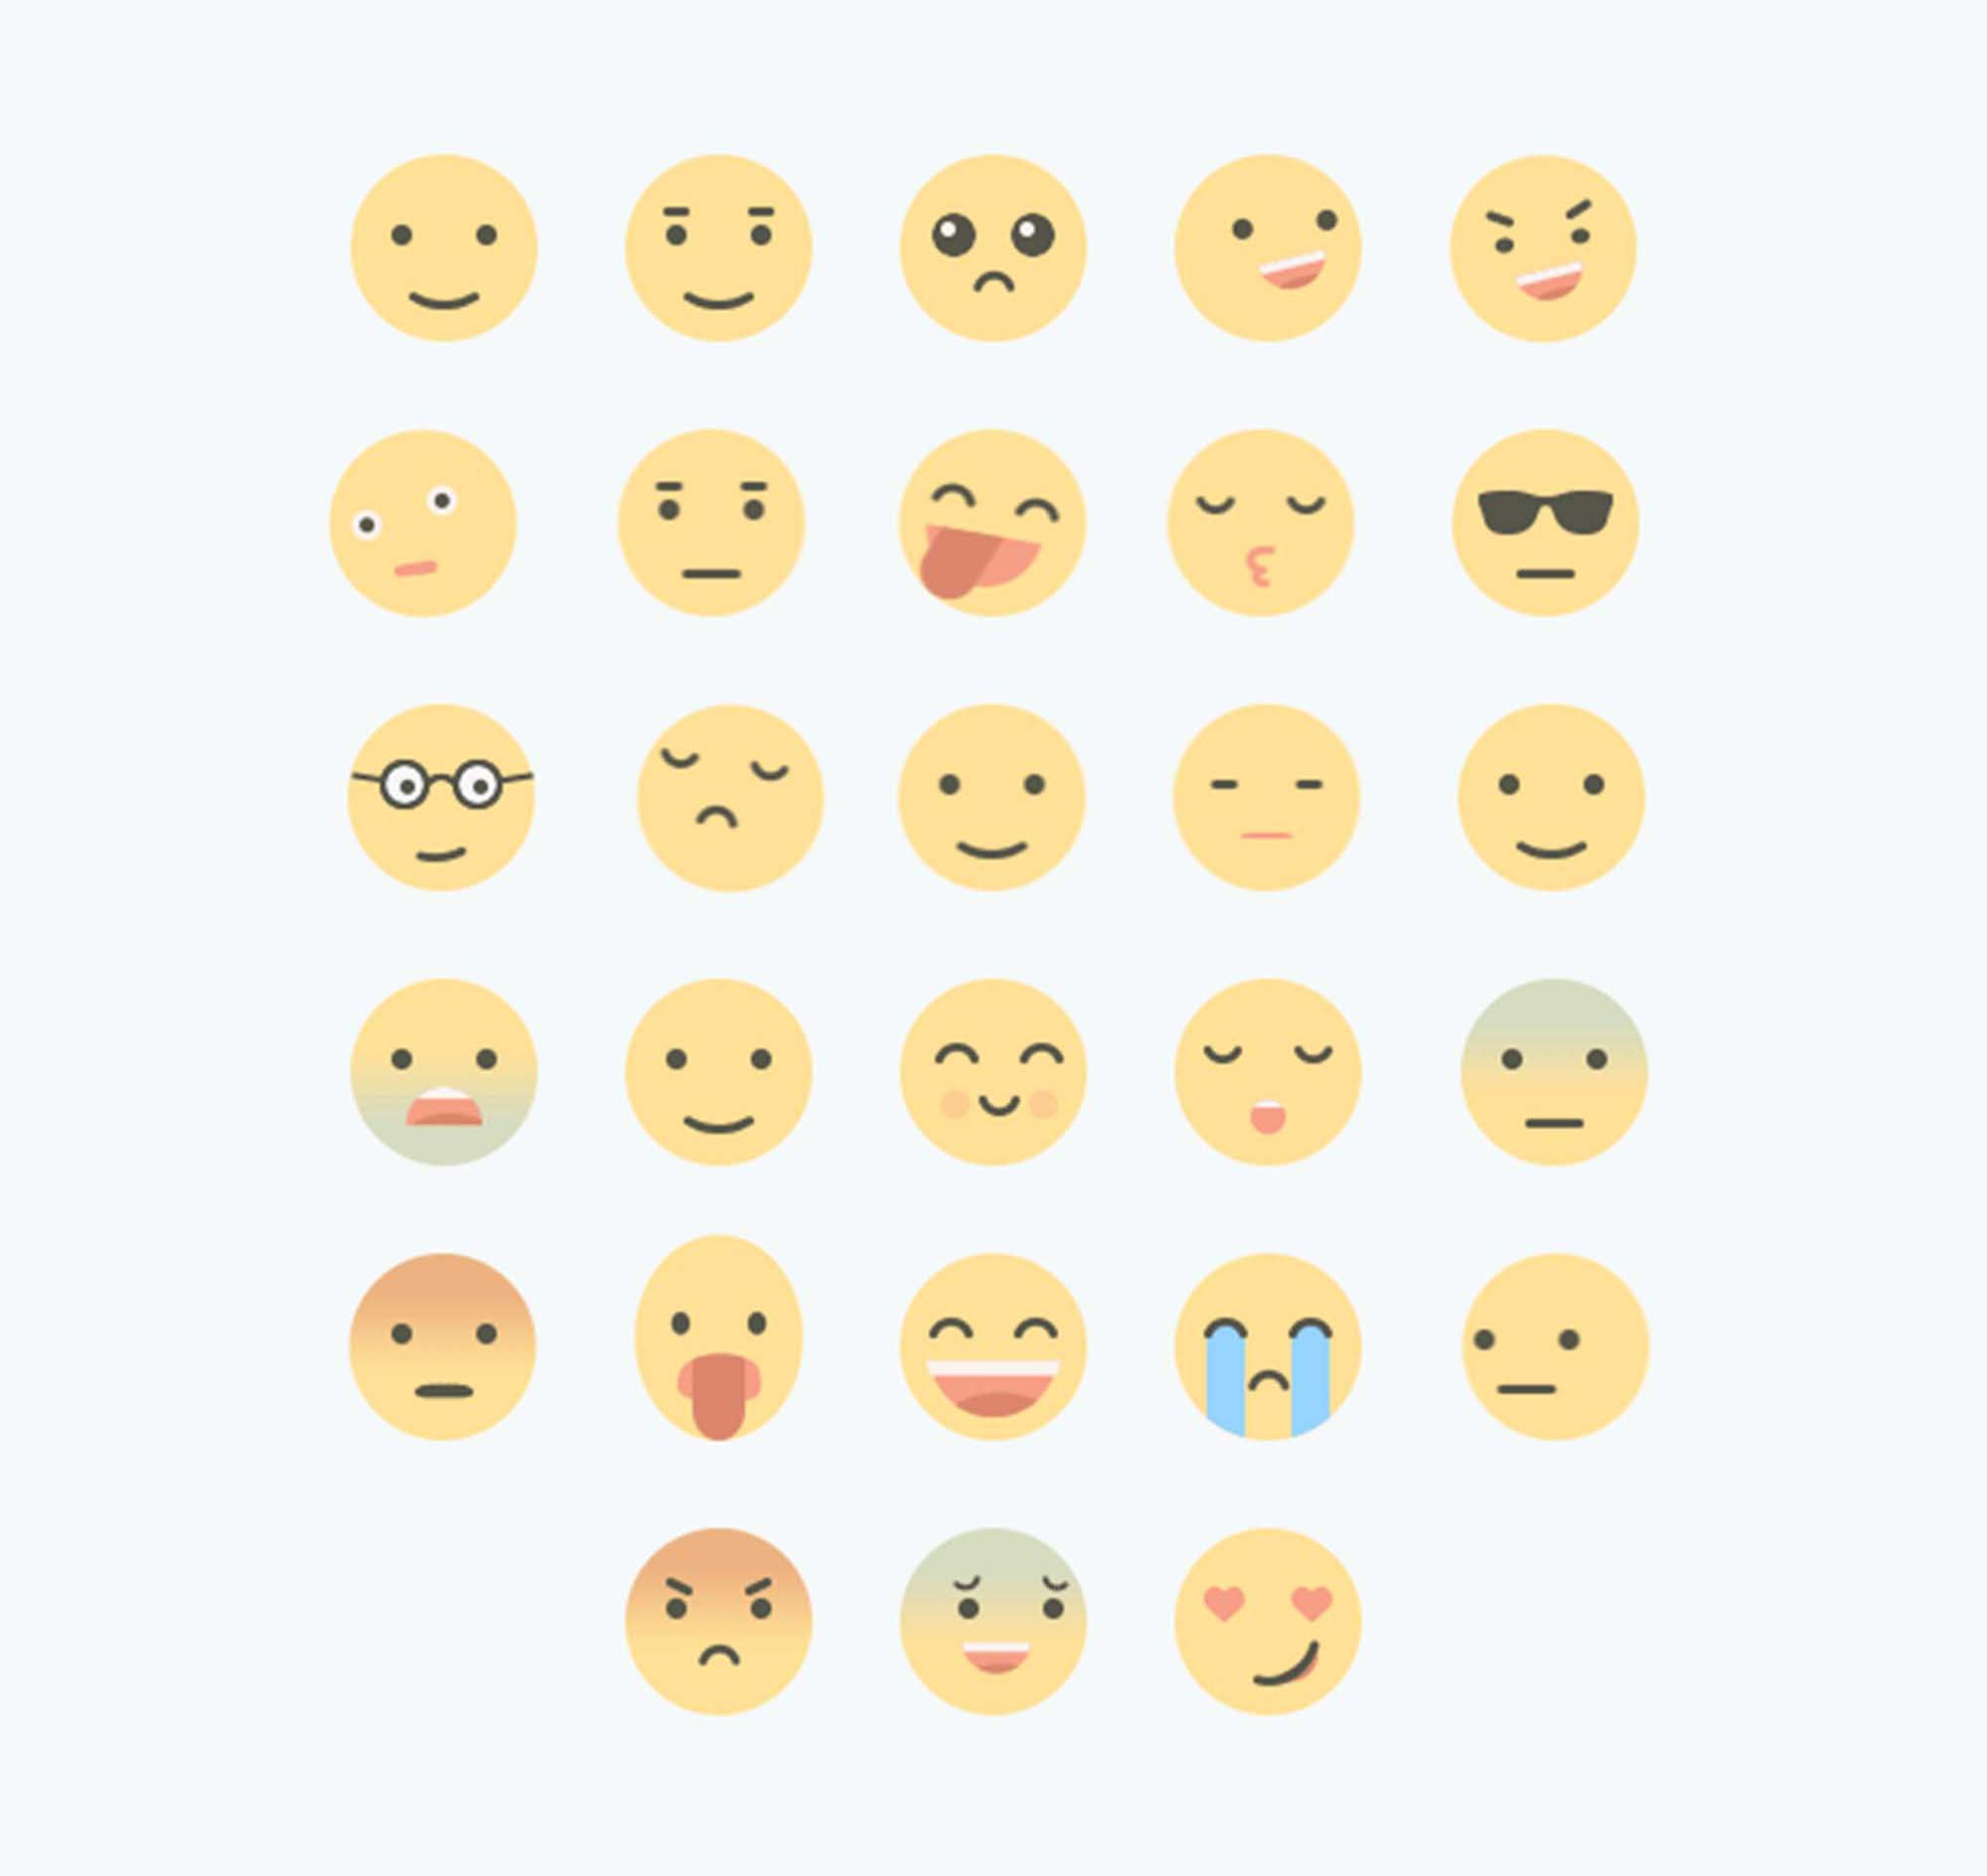 Animated Flat Emojis